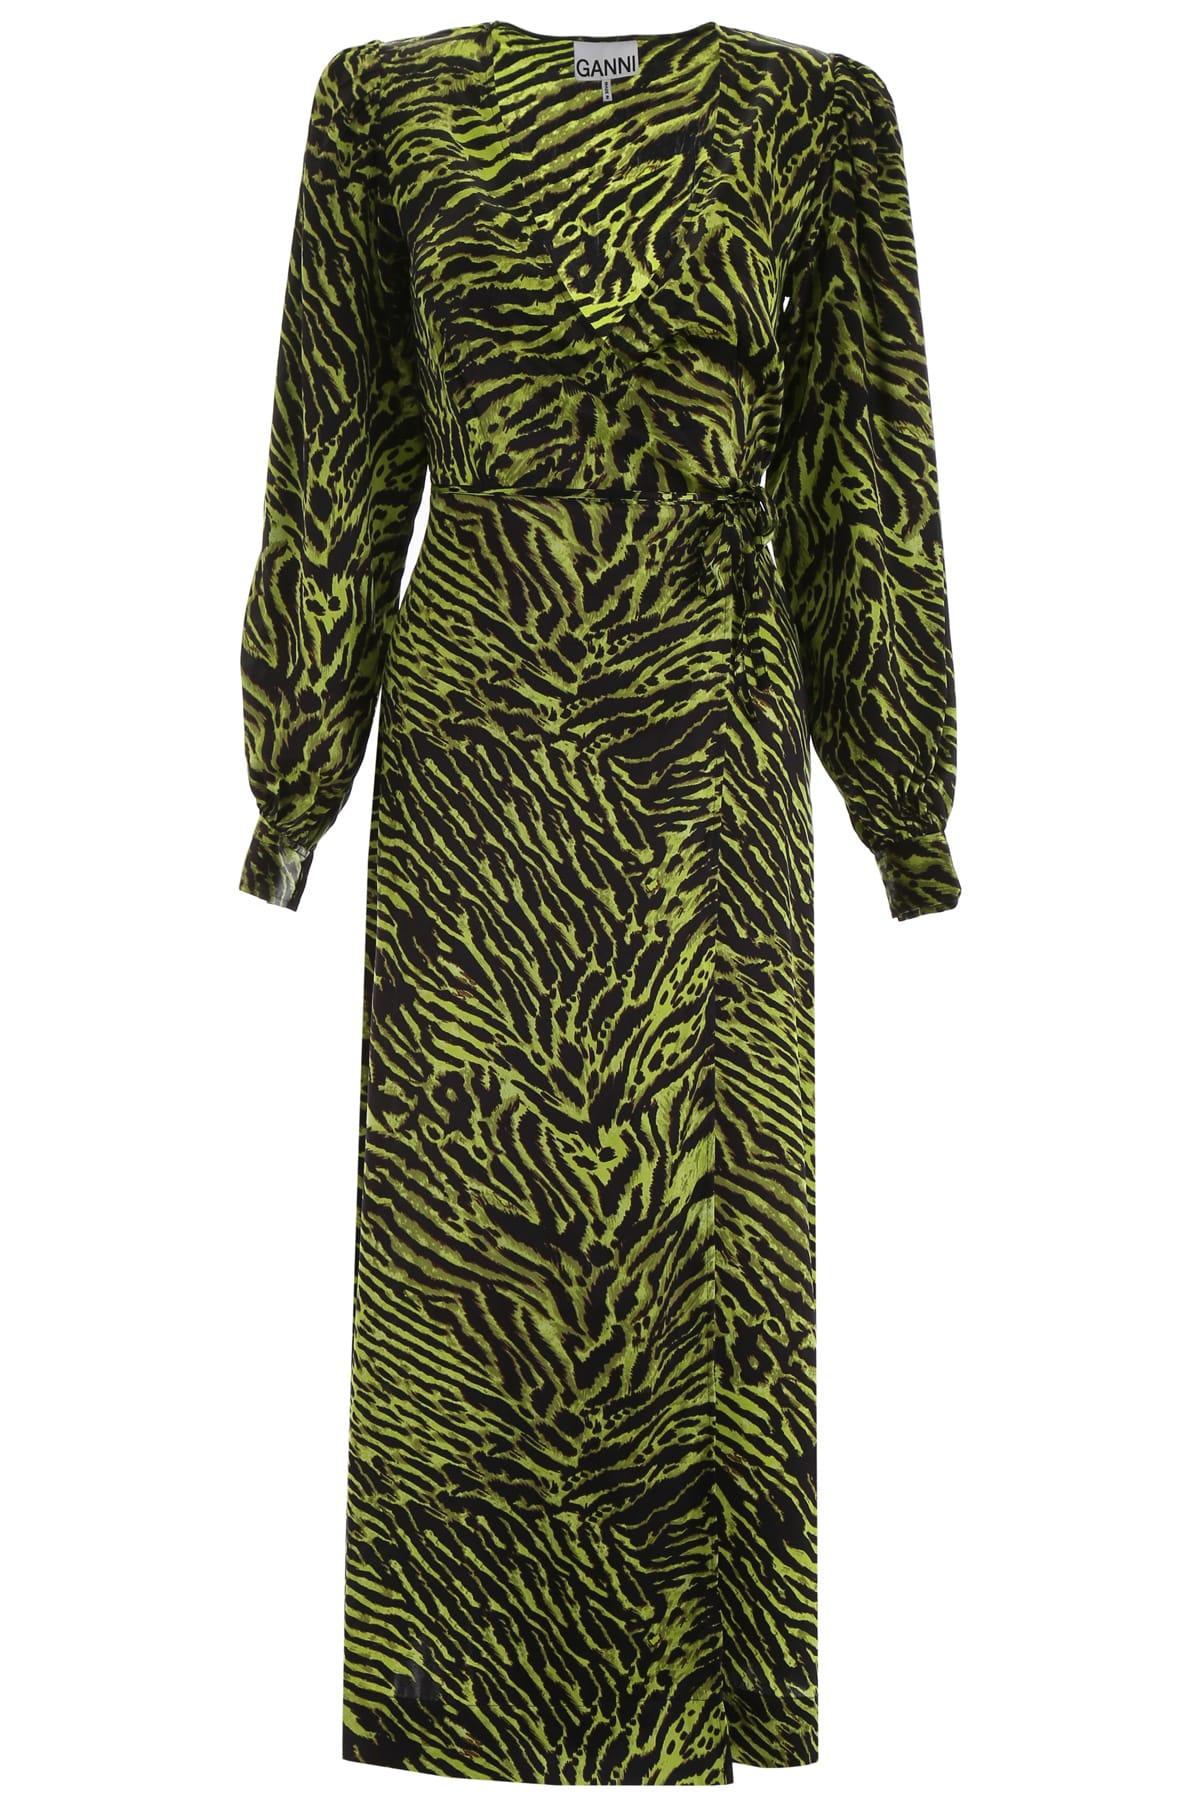 Buy Ganni Zebra-printed Wrap Dress online, shop Ganni with free shipping